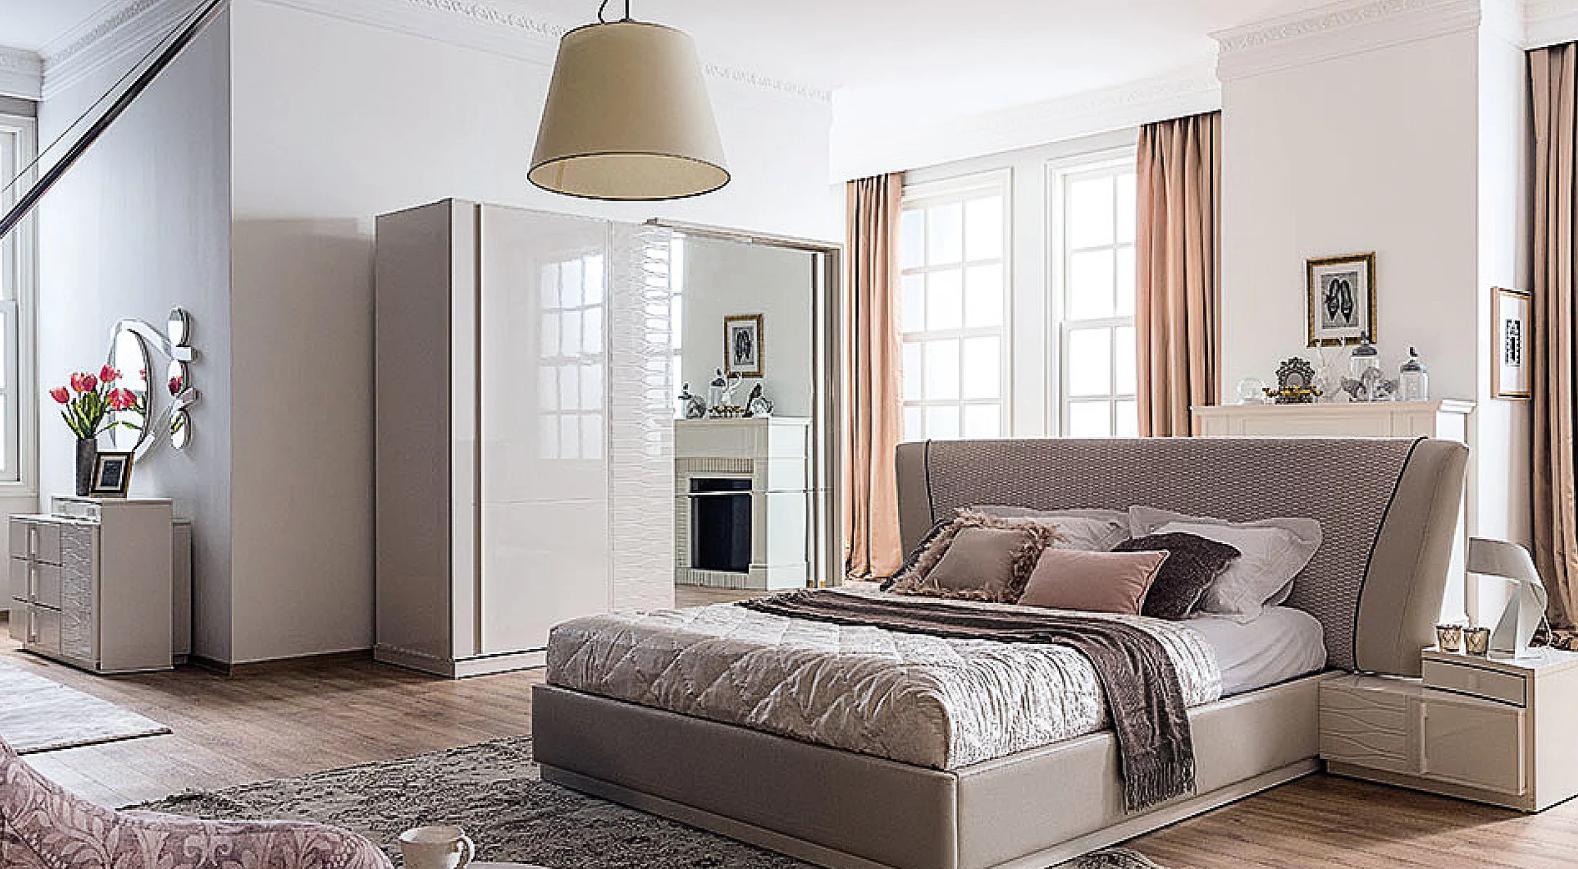 افضل واجمل غرف نوم مودرن حديثة للعرسان 2019 بالصور غرف نوم كامله